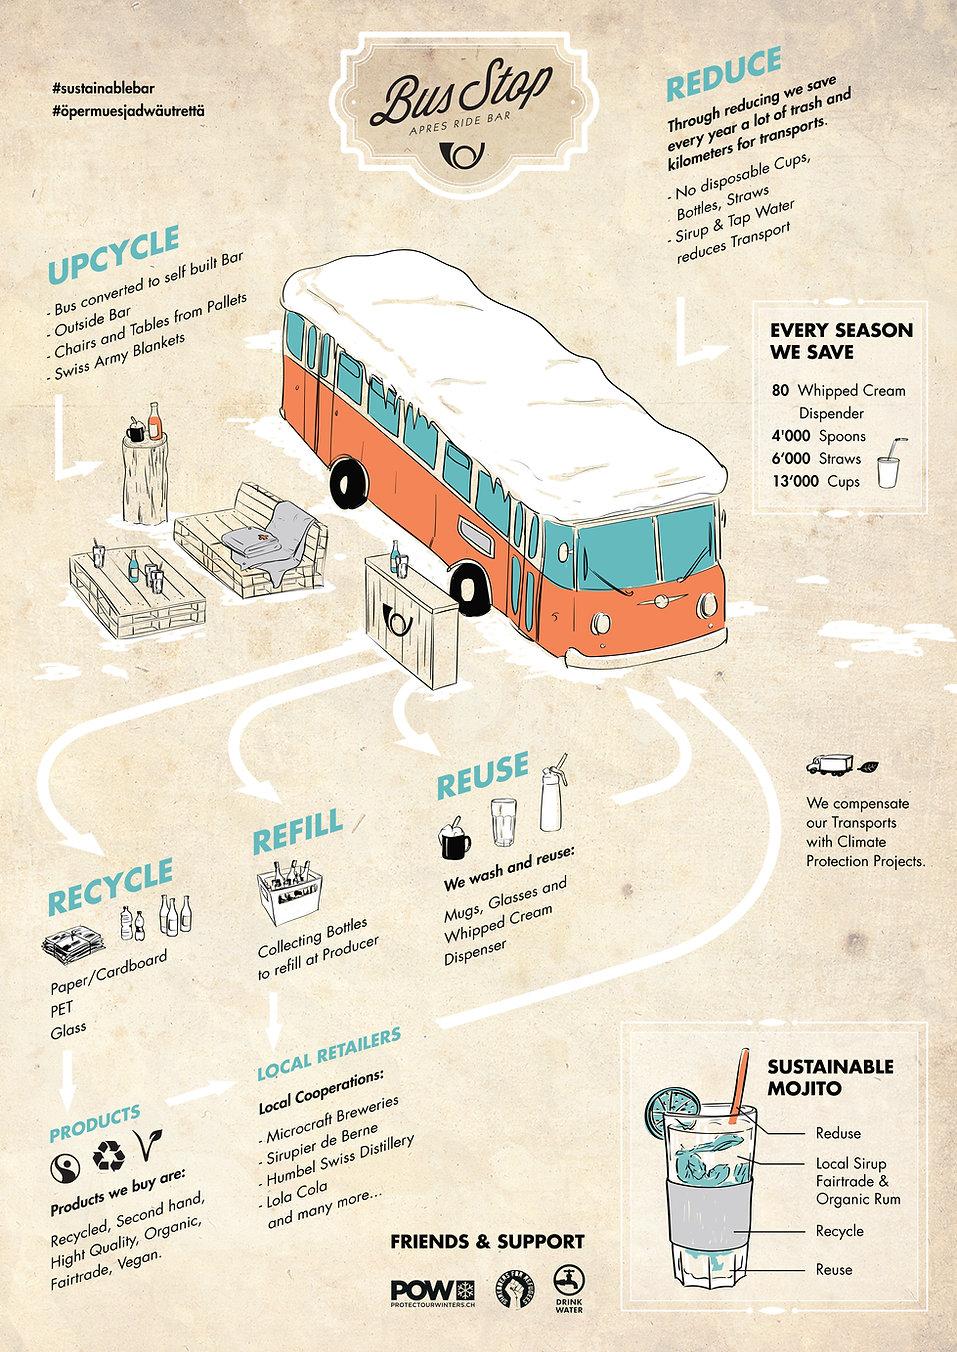 Infographic-Busstop-final_20181129.jpg